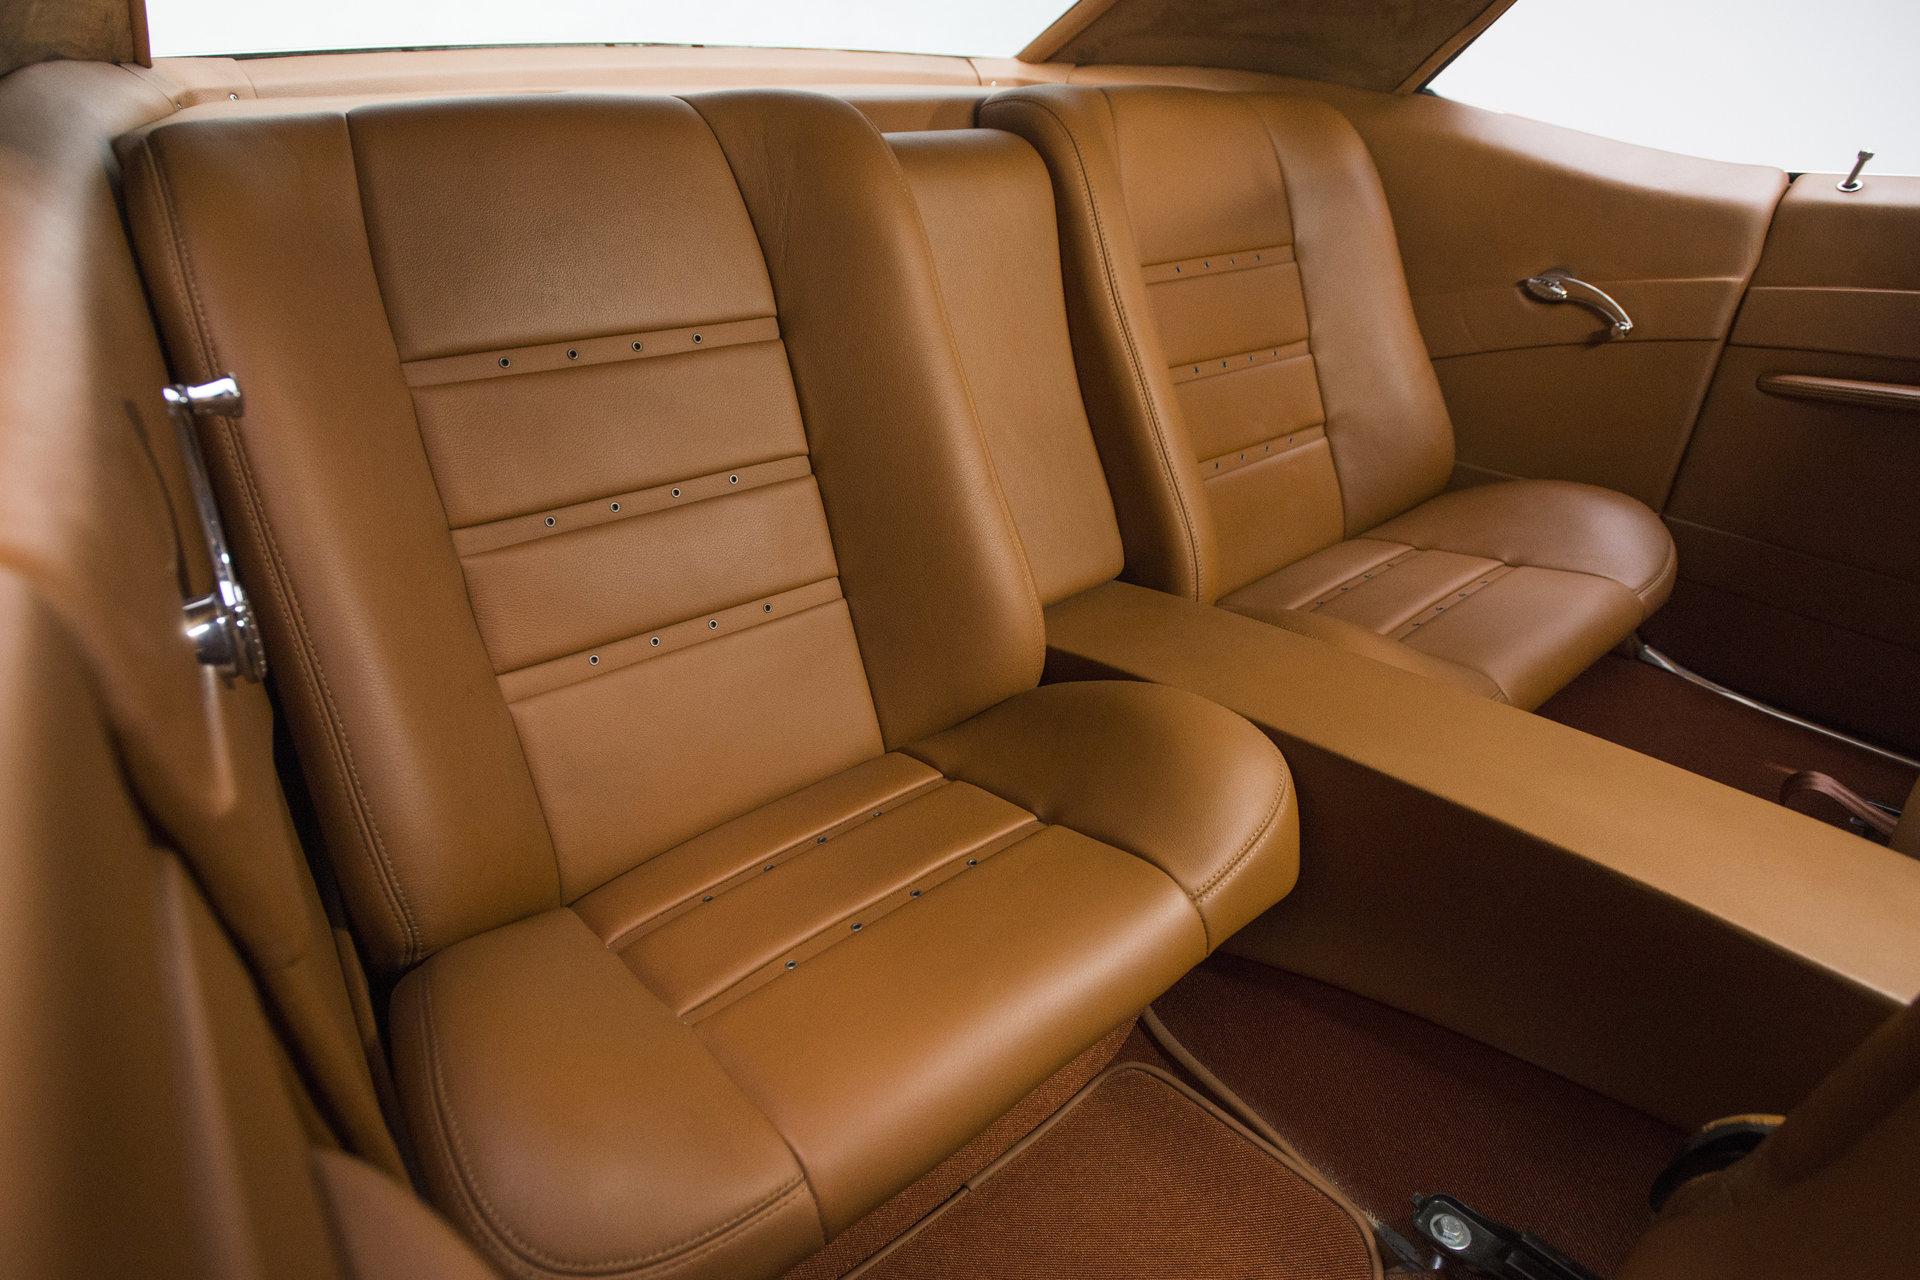 1968 Chevrolet Camaro For Sale 60328 Mcg Chevy Seat Belt